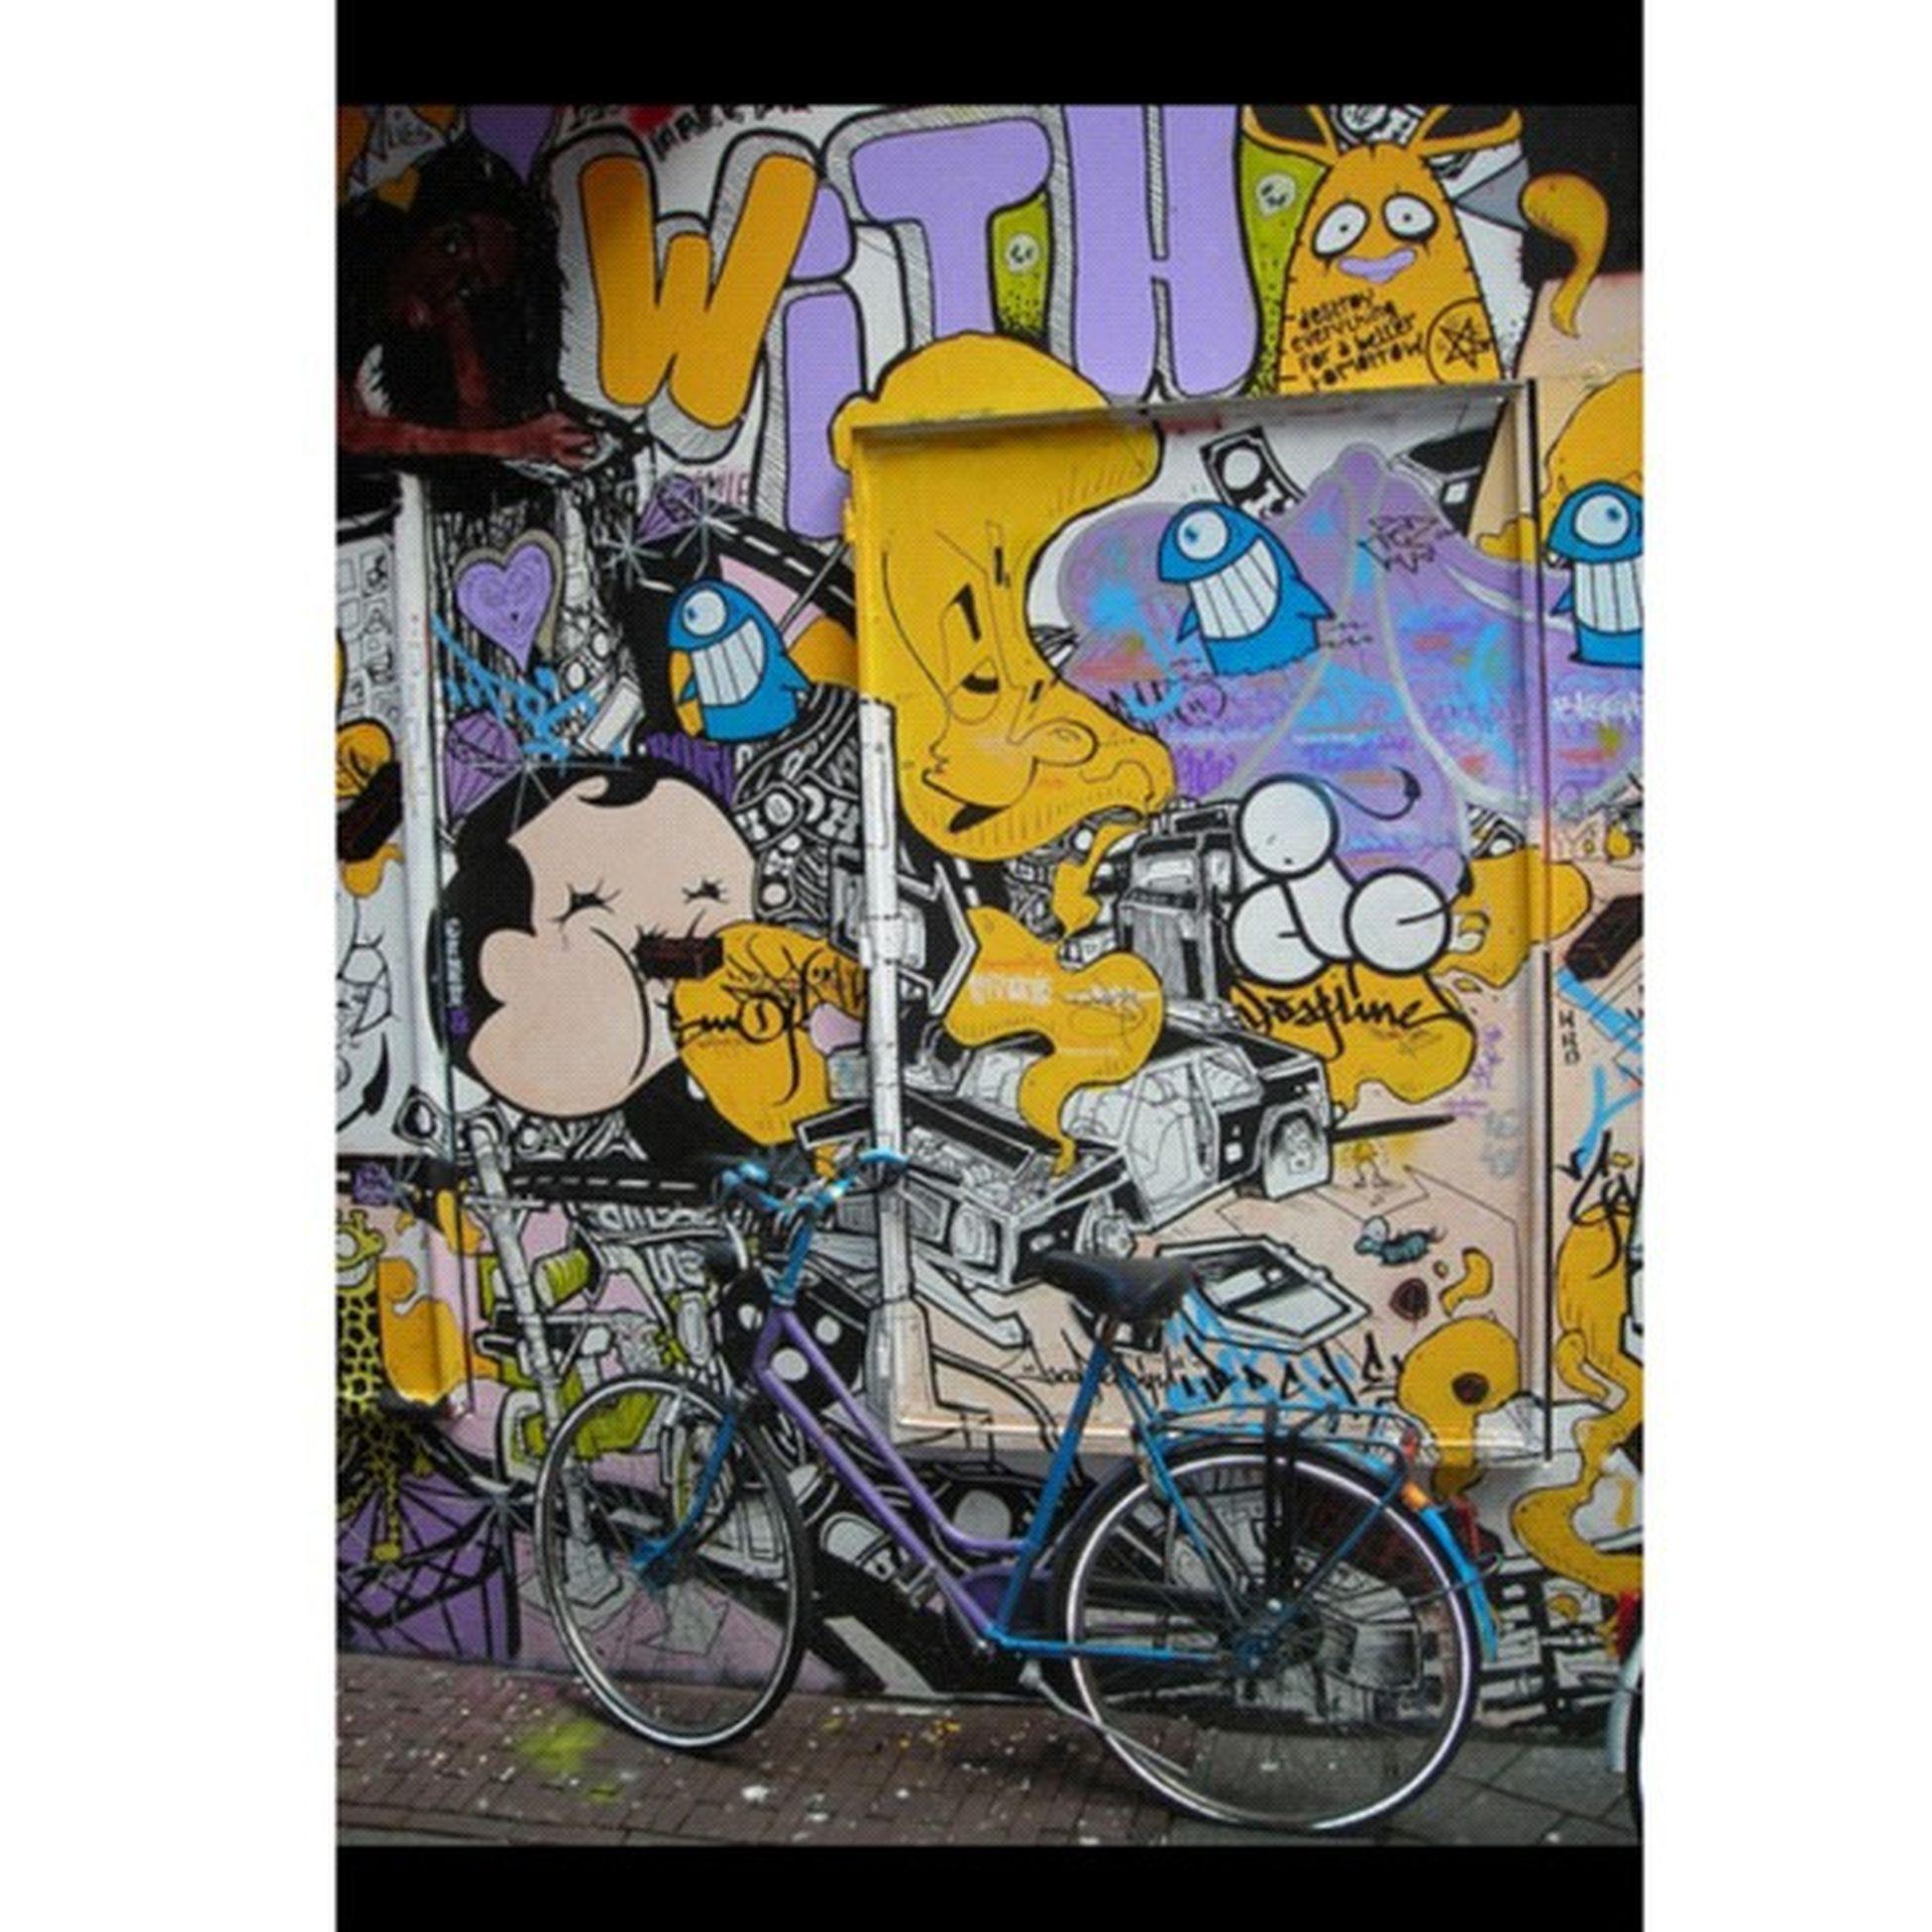 Arte callejero Instagood Statigram 30likes Gf_sistash Gf_brothas Gf_daily_streetartsaturday_002 Photooftheday Instagram FotoDelDia Gang_family Gf_spain Gf_daily Instagrameando Iphone4